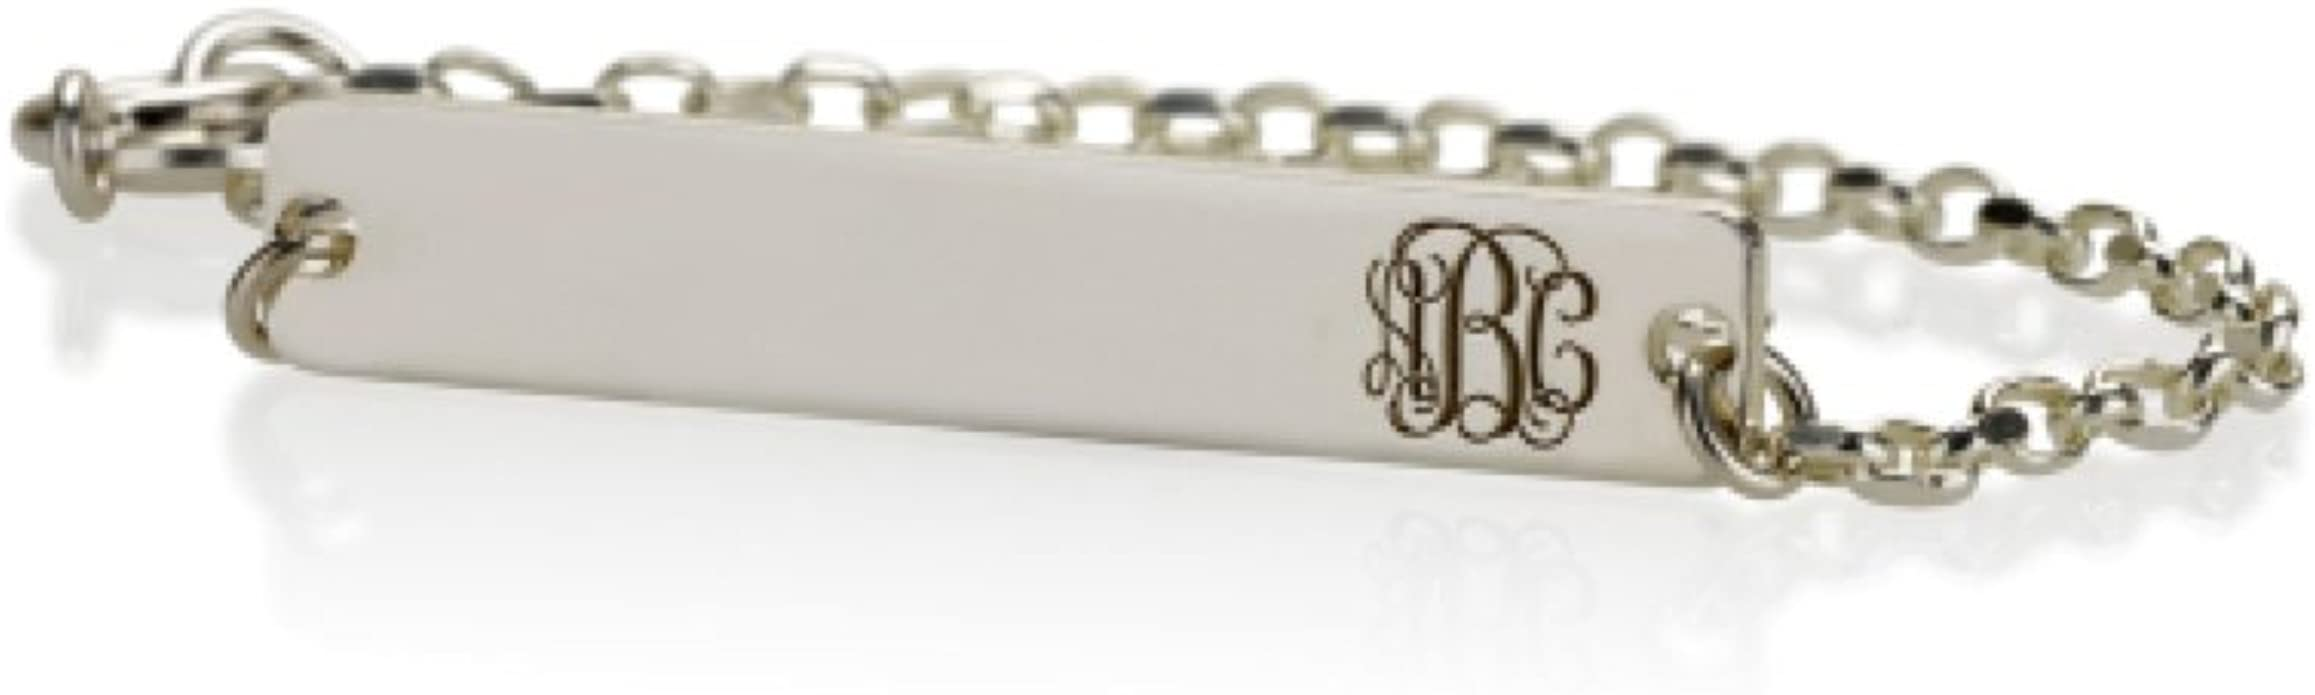 Jewelry Initial Bracelet Gift Sterling Silver Bar Bracelet Birthstone Bracelet